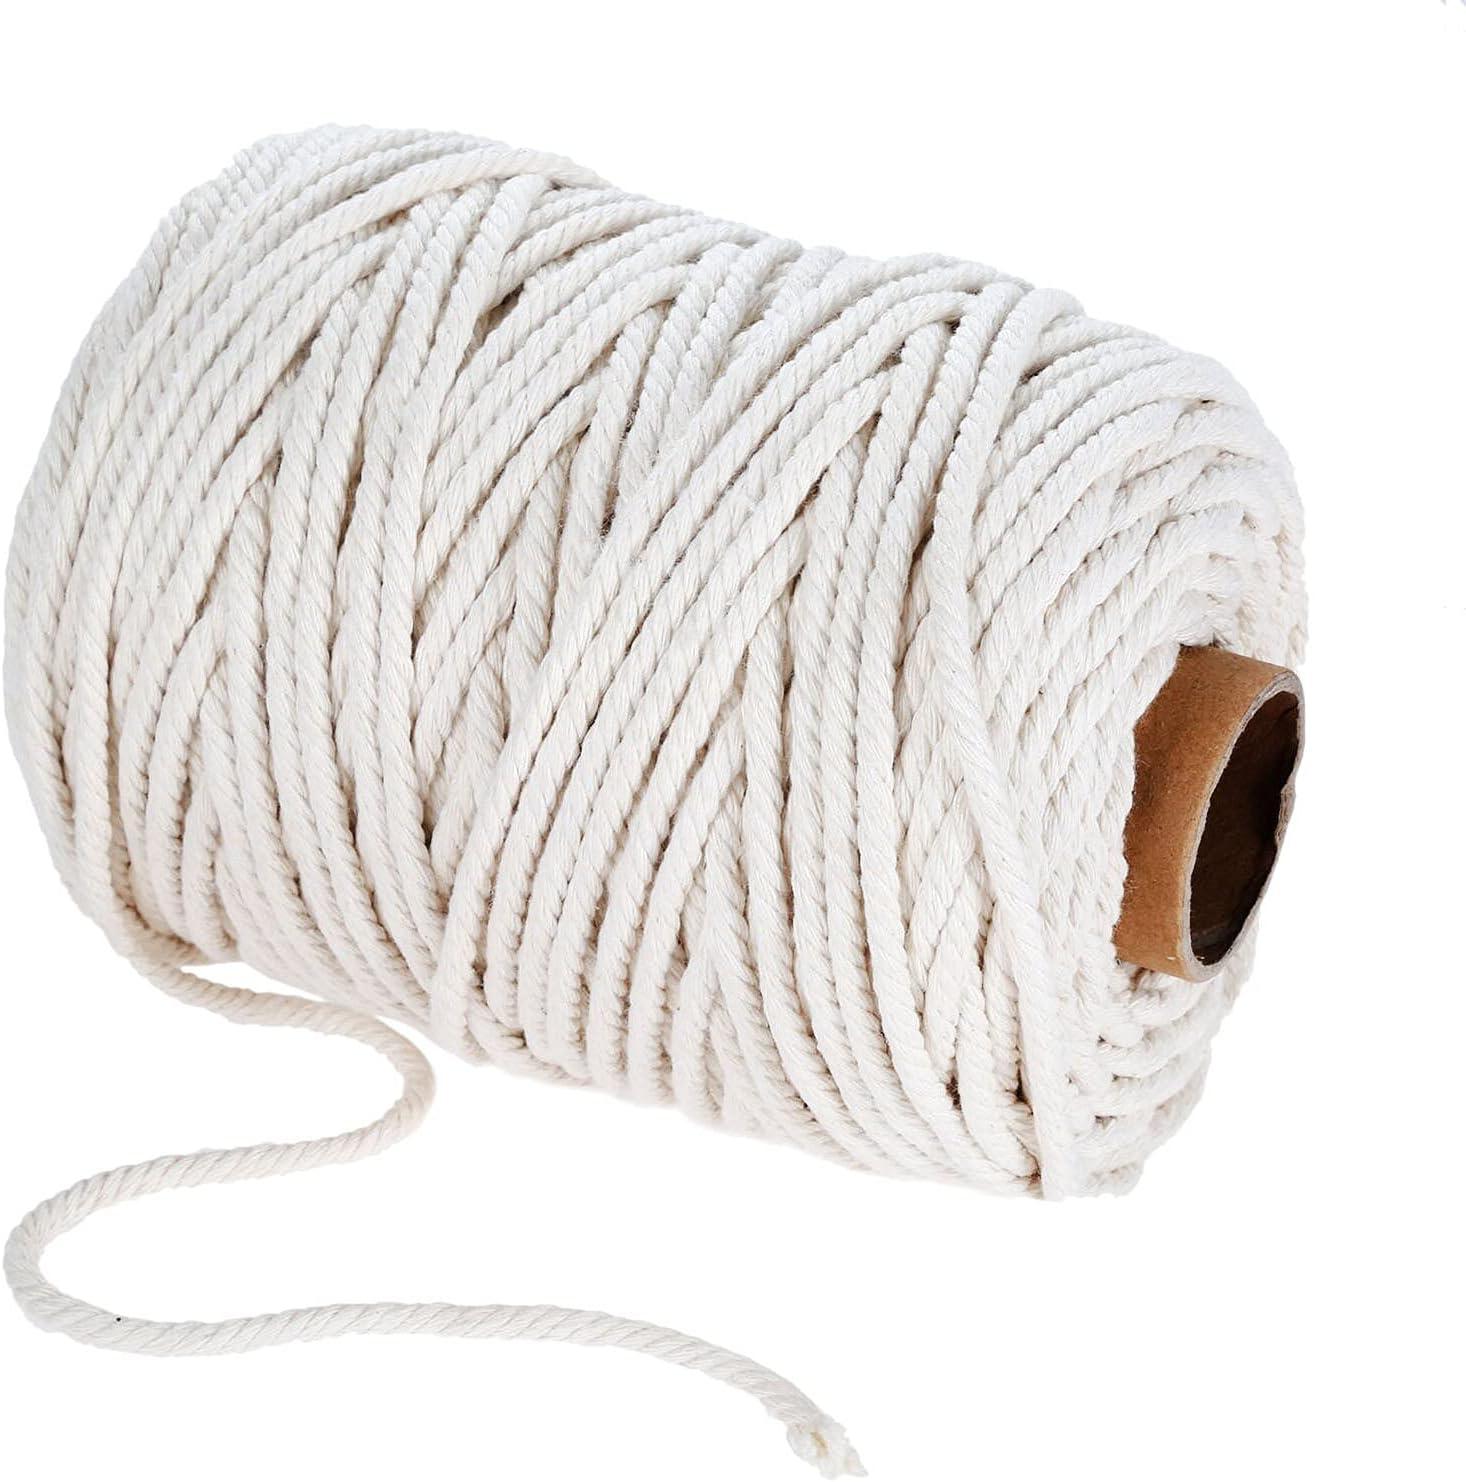 PAZIKO 1 2 3 4 5 6 8 Twisted Cord Rope El Paso Mall Braided Craft Phoenix Mall Cotton 10mm